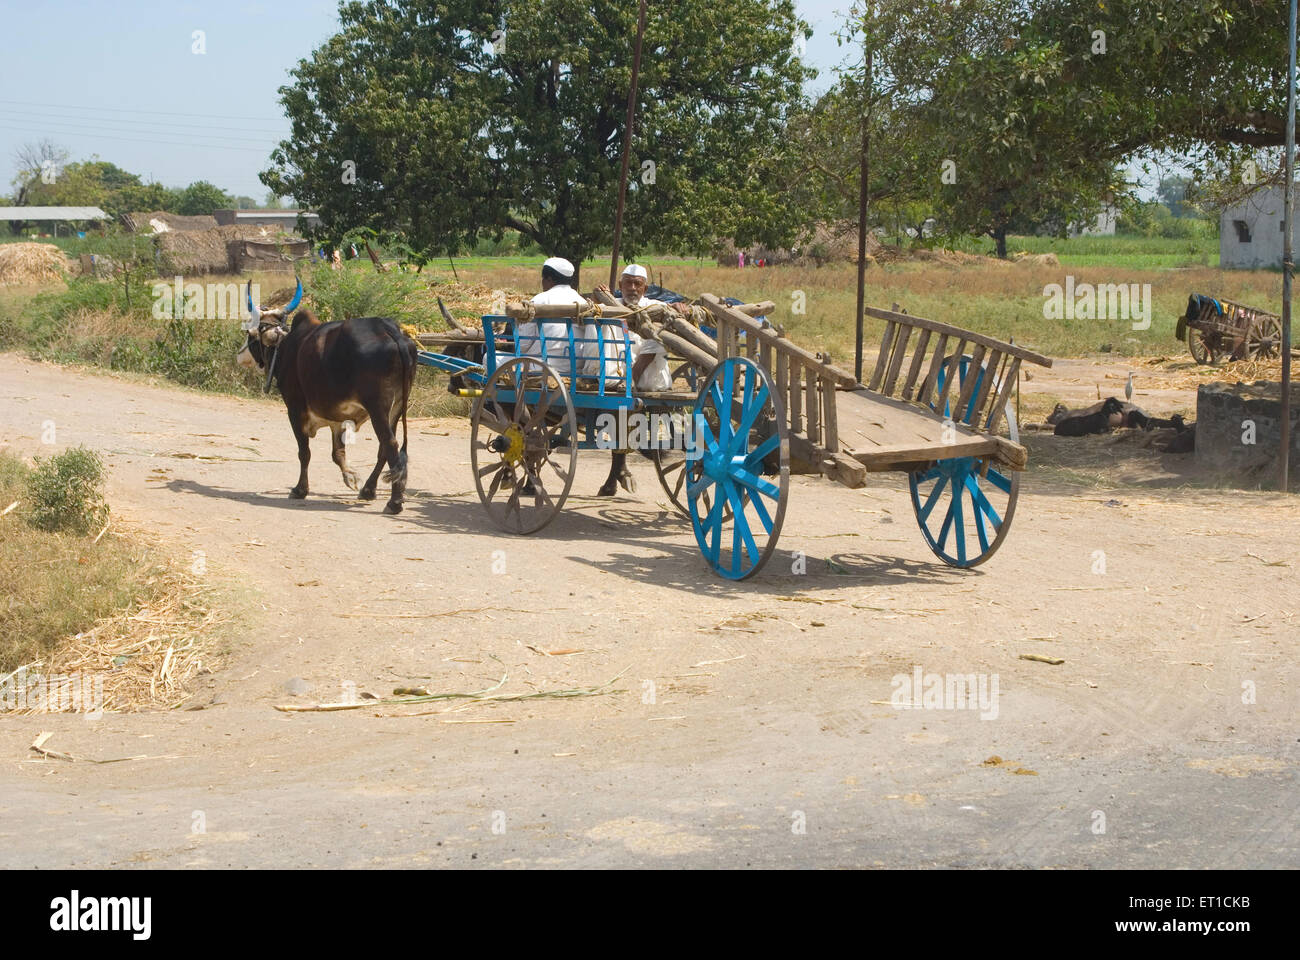 Bullock carts on road of shingnapur ; Nasik ; Maharashtra ; India MR#704 - Stock Image